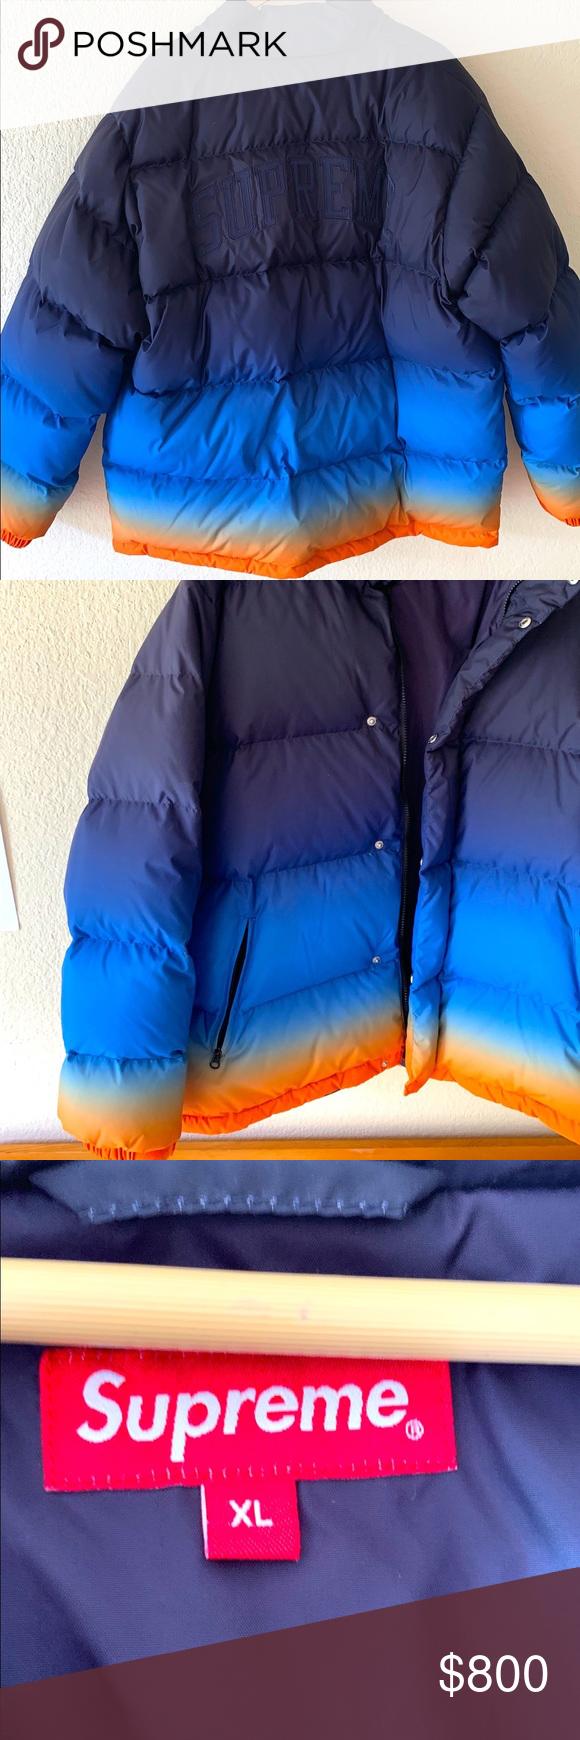 Supreme Puffer Jacket Puffer Jackets Jackets Puffer [ 1740 x 580 Pixel ]